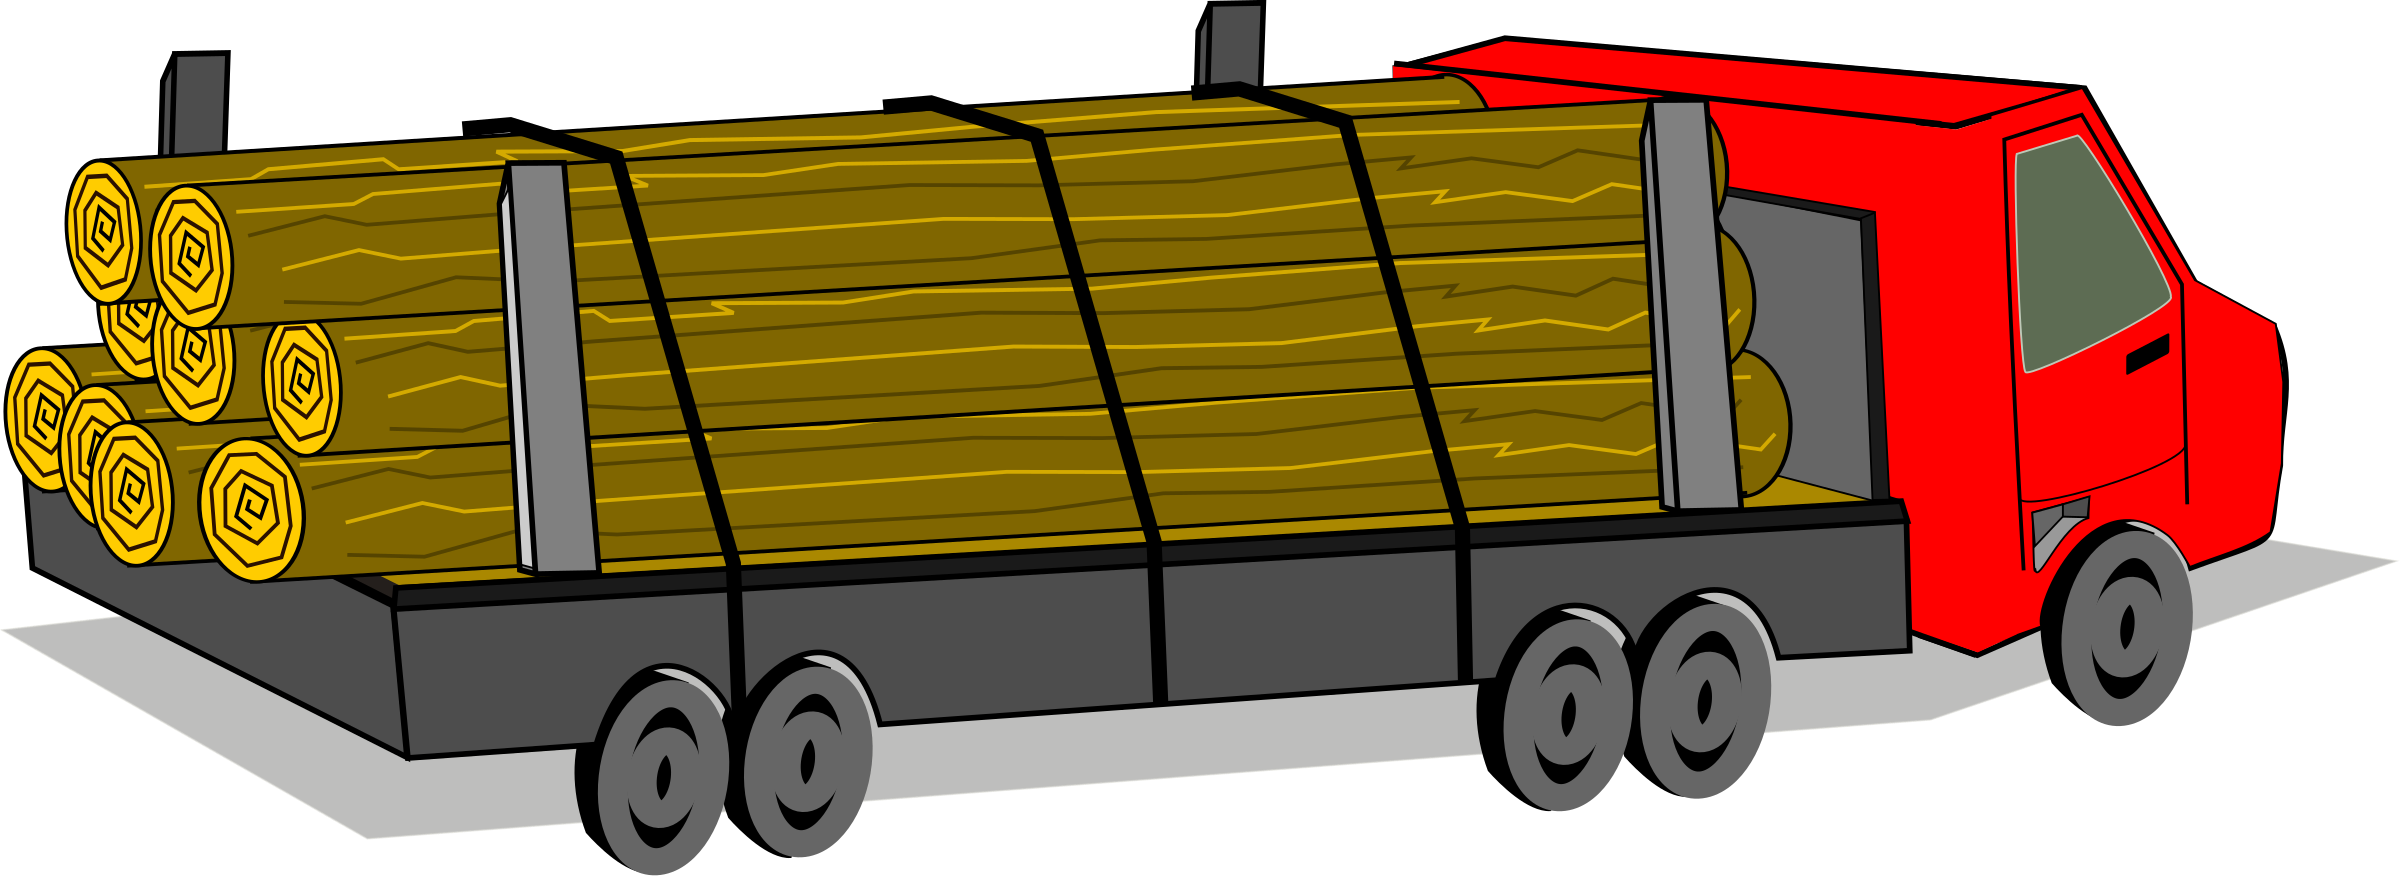 Truck log clipart explore pictures